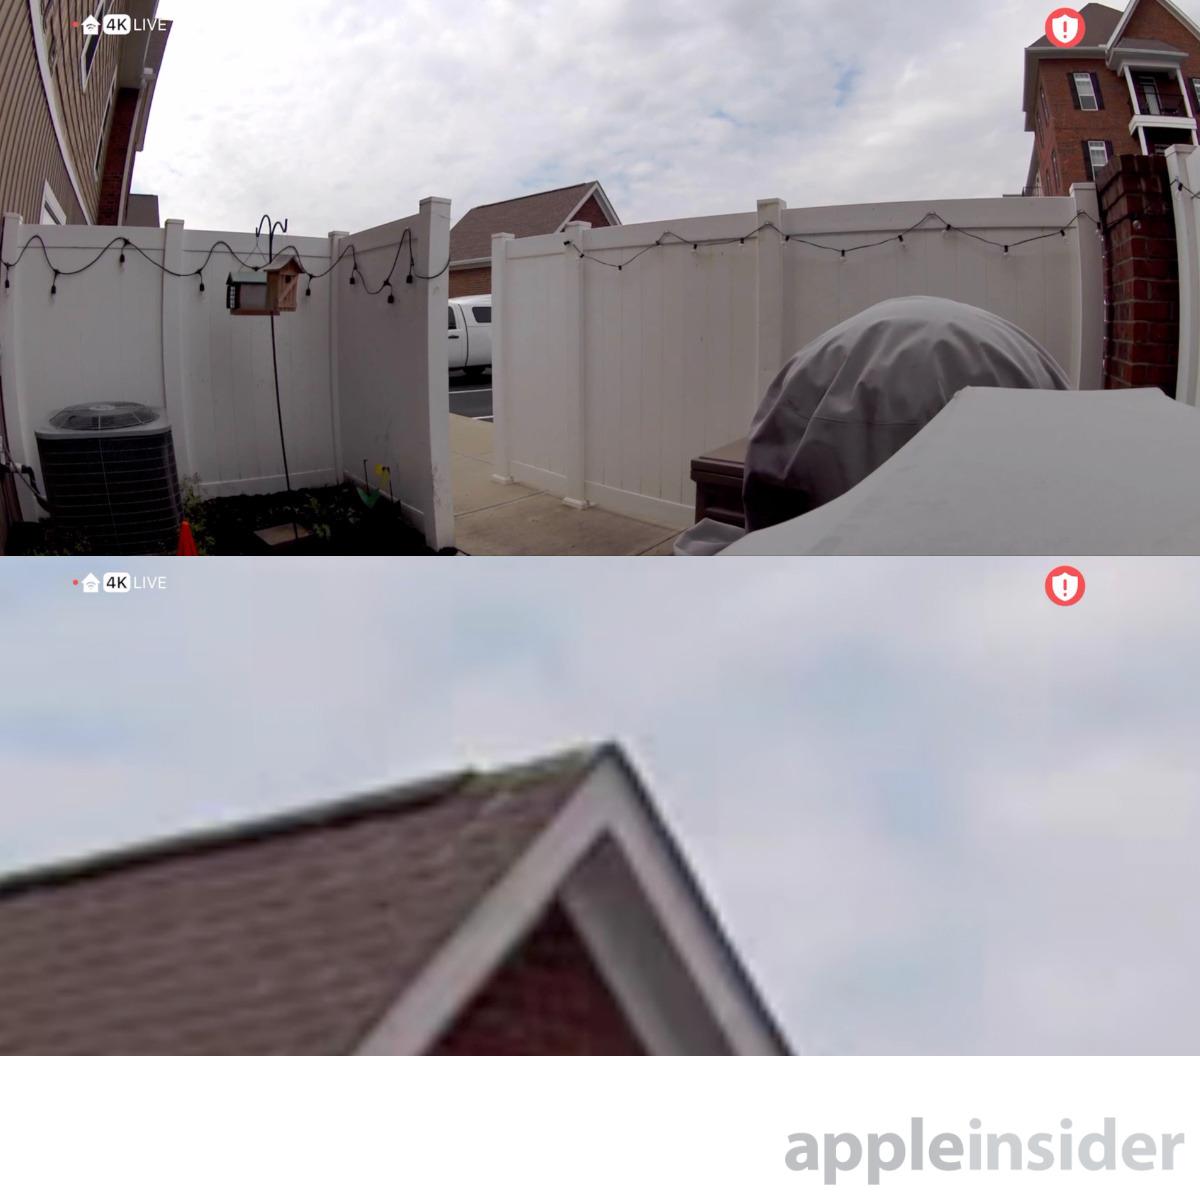 Arlo Ultra at 4K —  Wide angle (top) and 12X digital zoom (bottom)